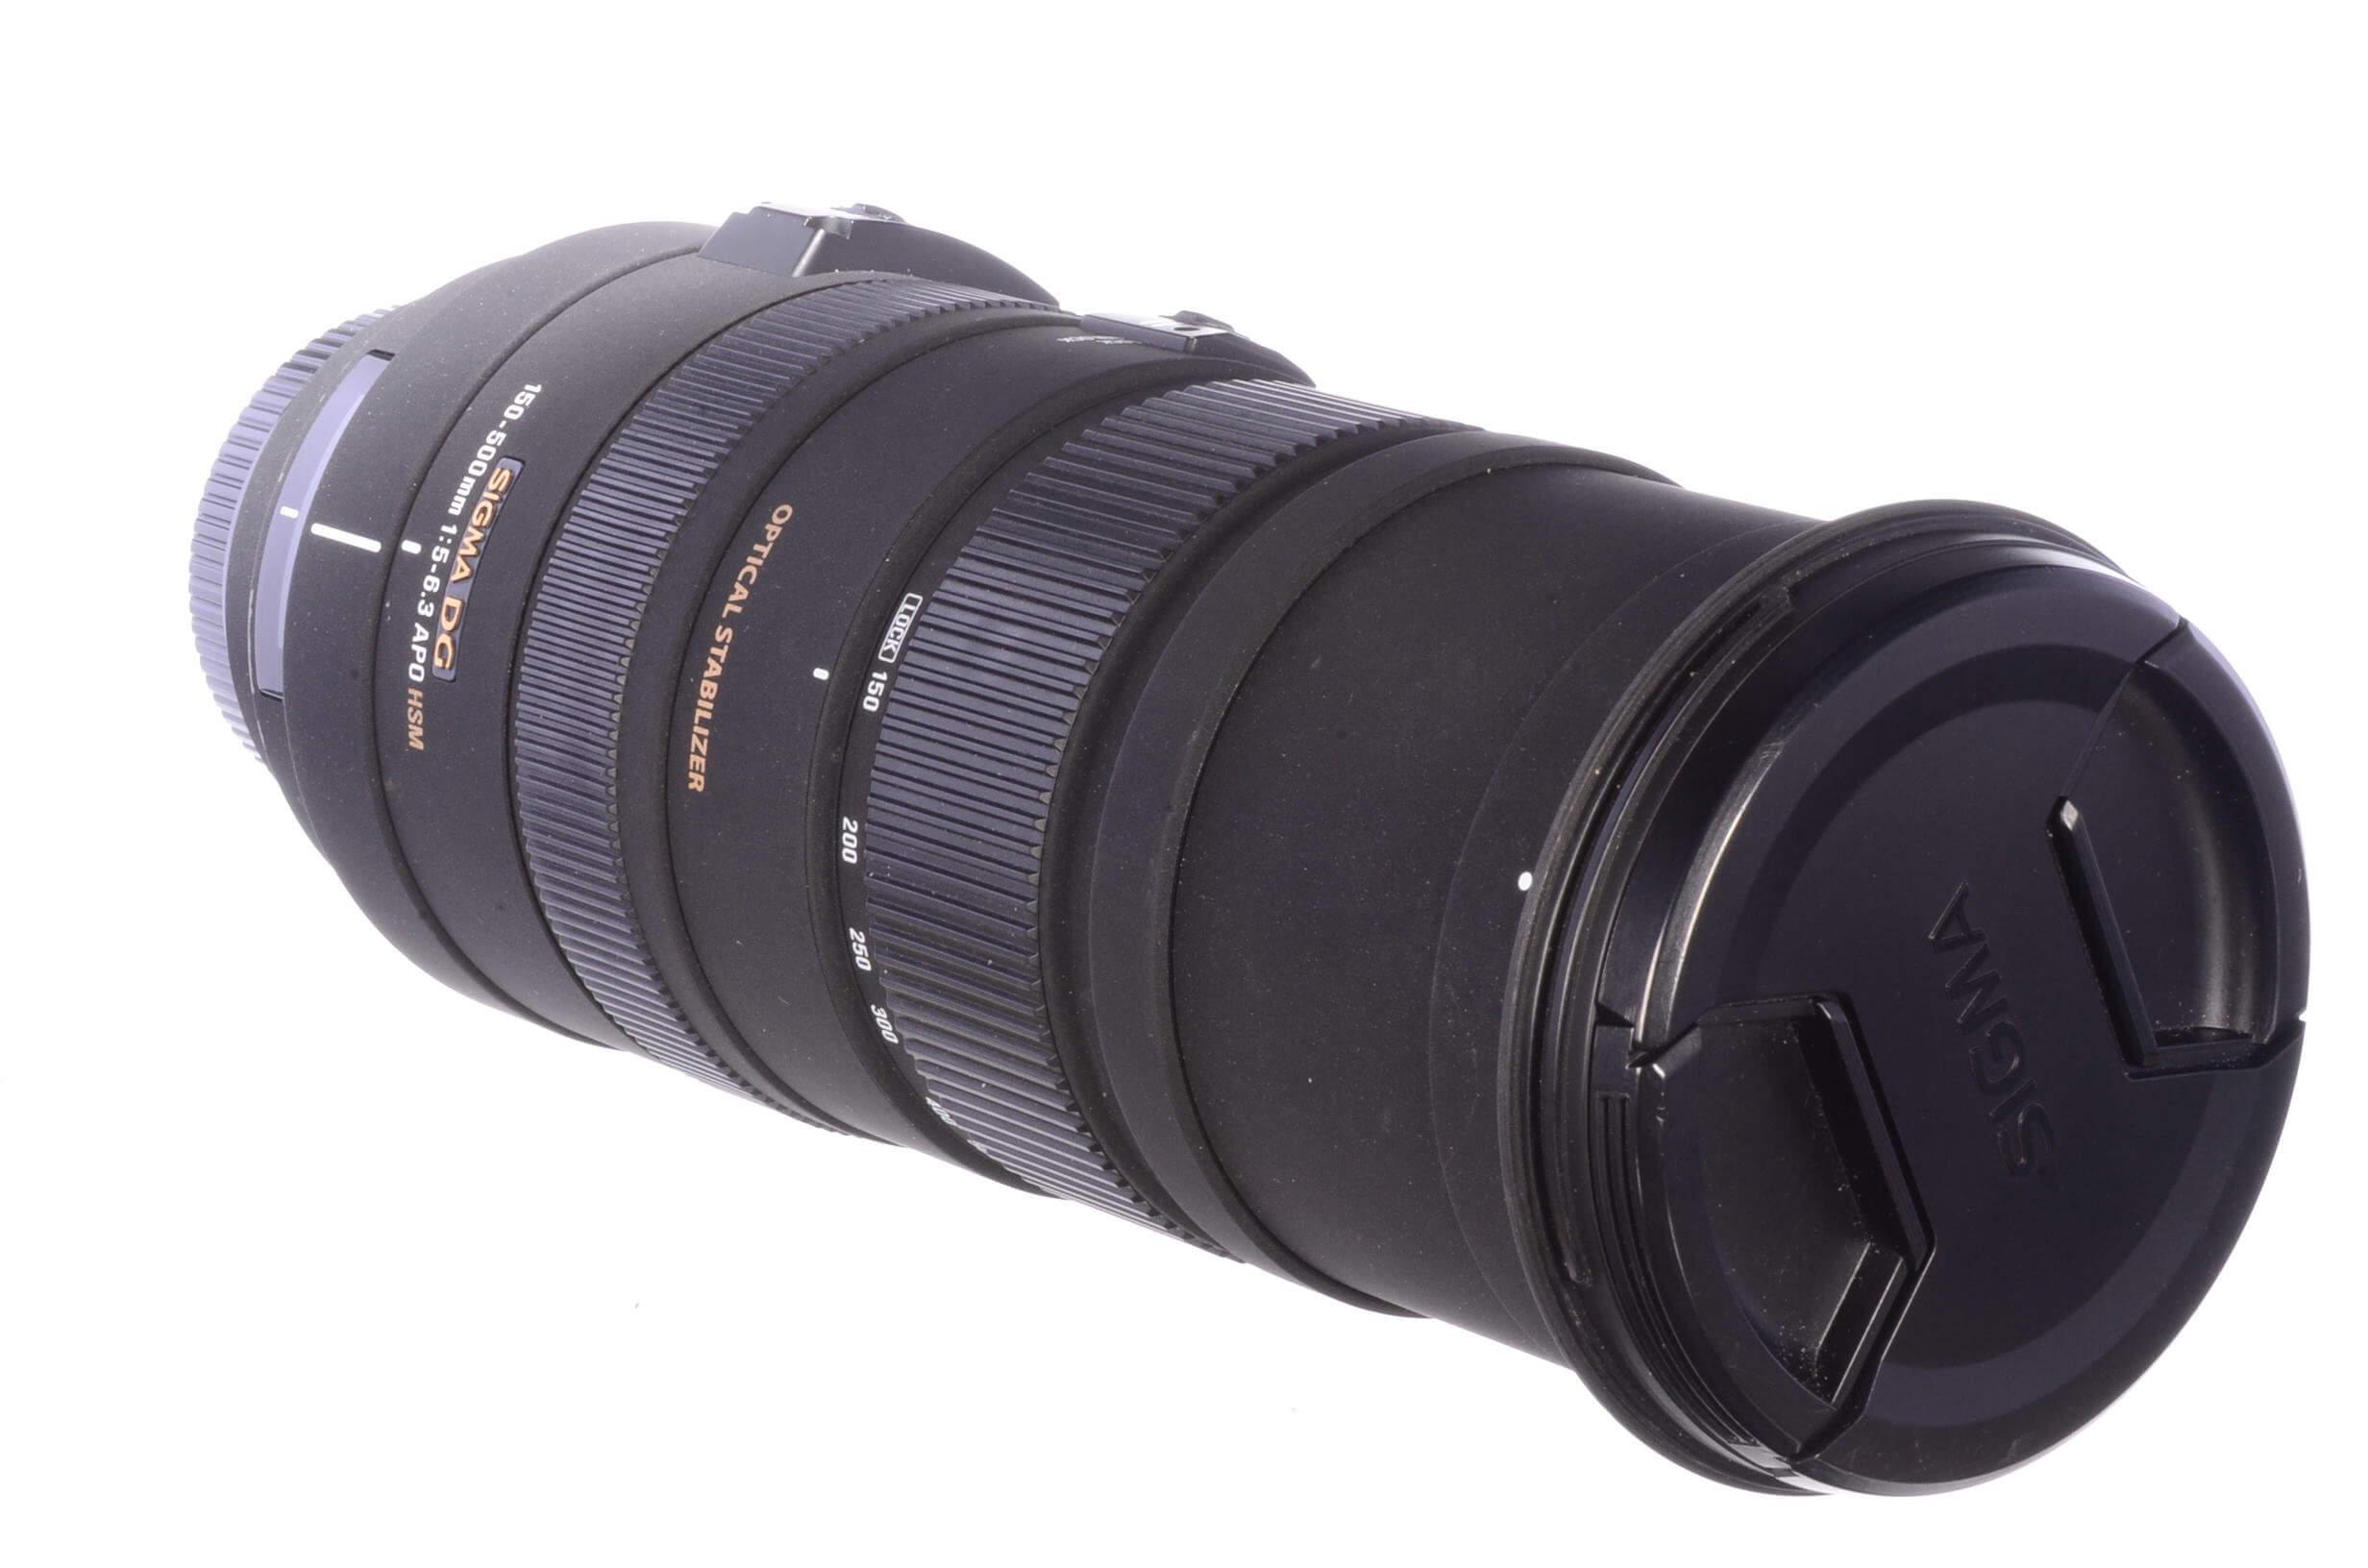 Sigma 150-500mm f5-6.3 DG APO HSM, Canon fitting